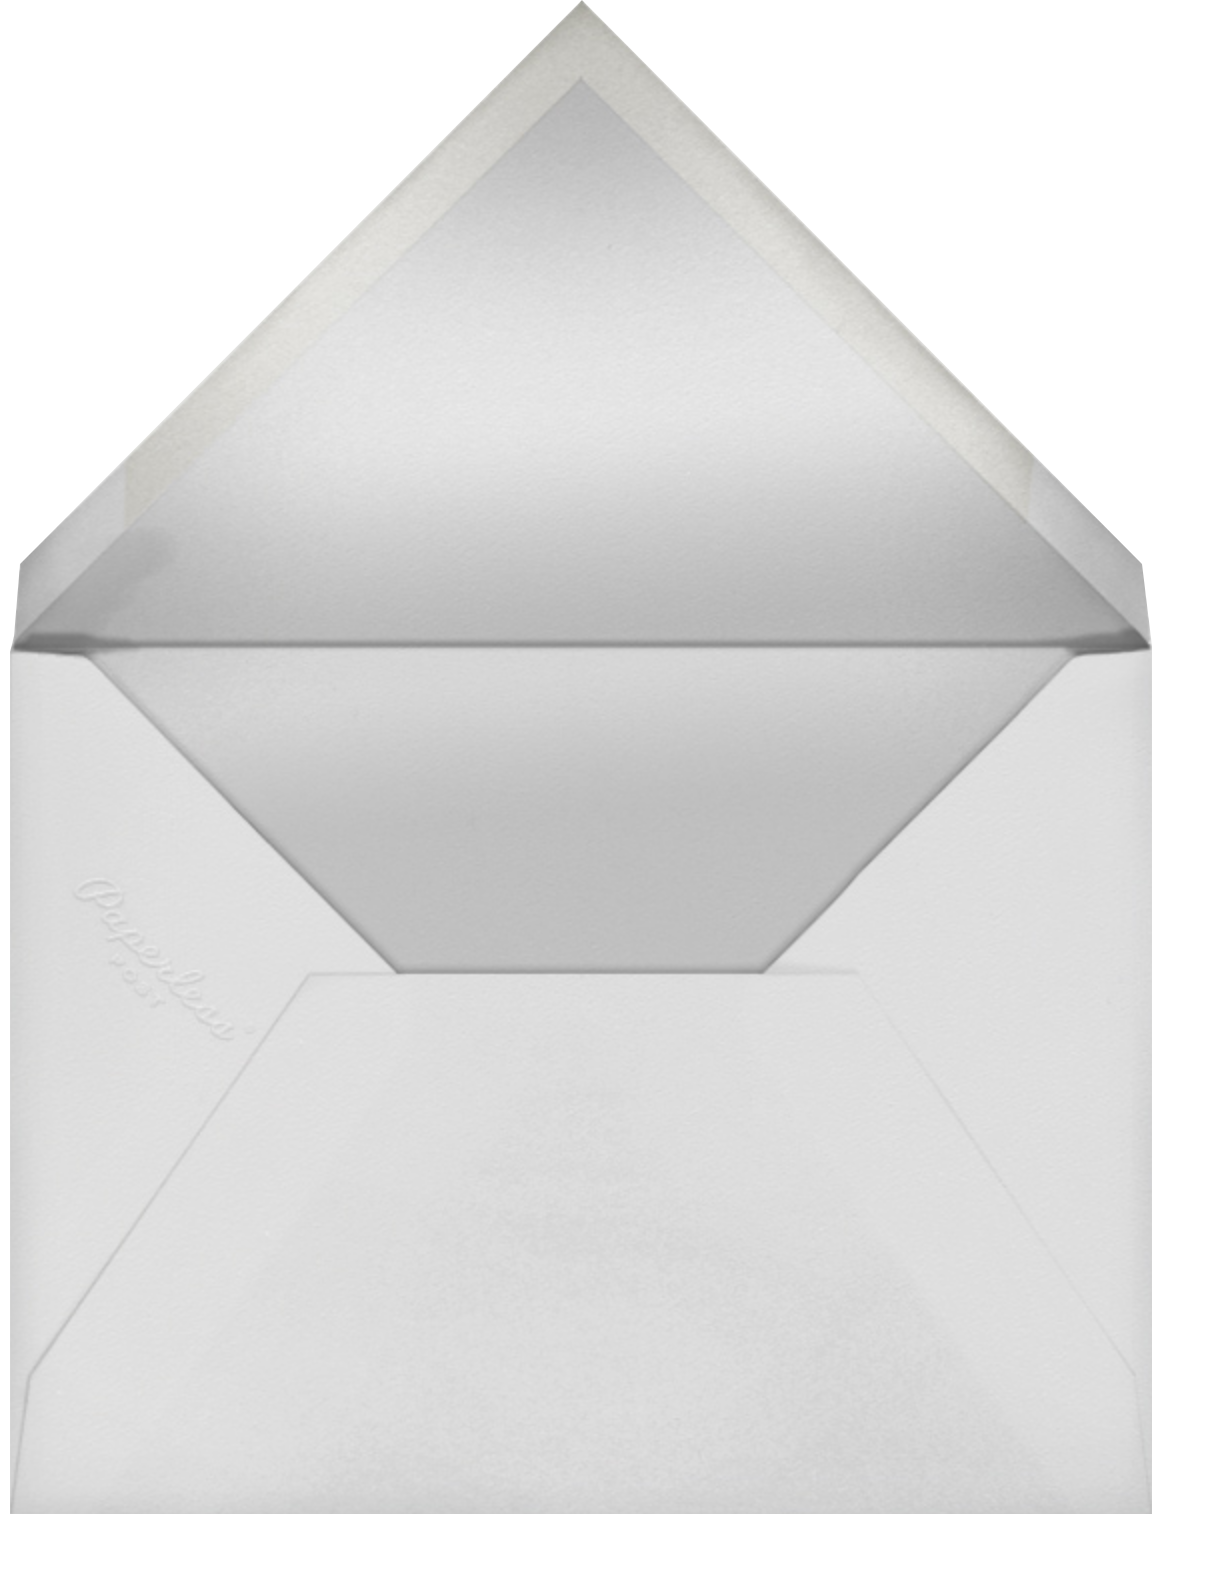 Confetti (Program) - Navy/Silver - kate spade new york - Menus and programs - envelope back